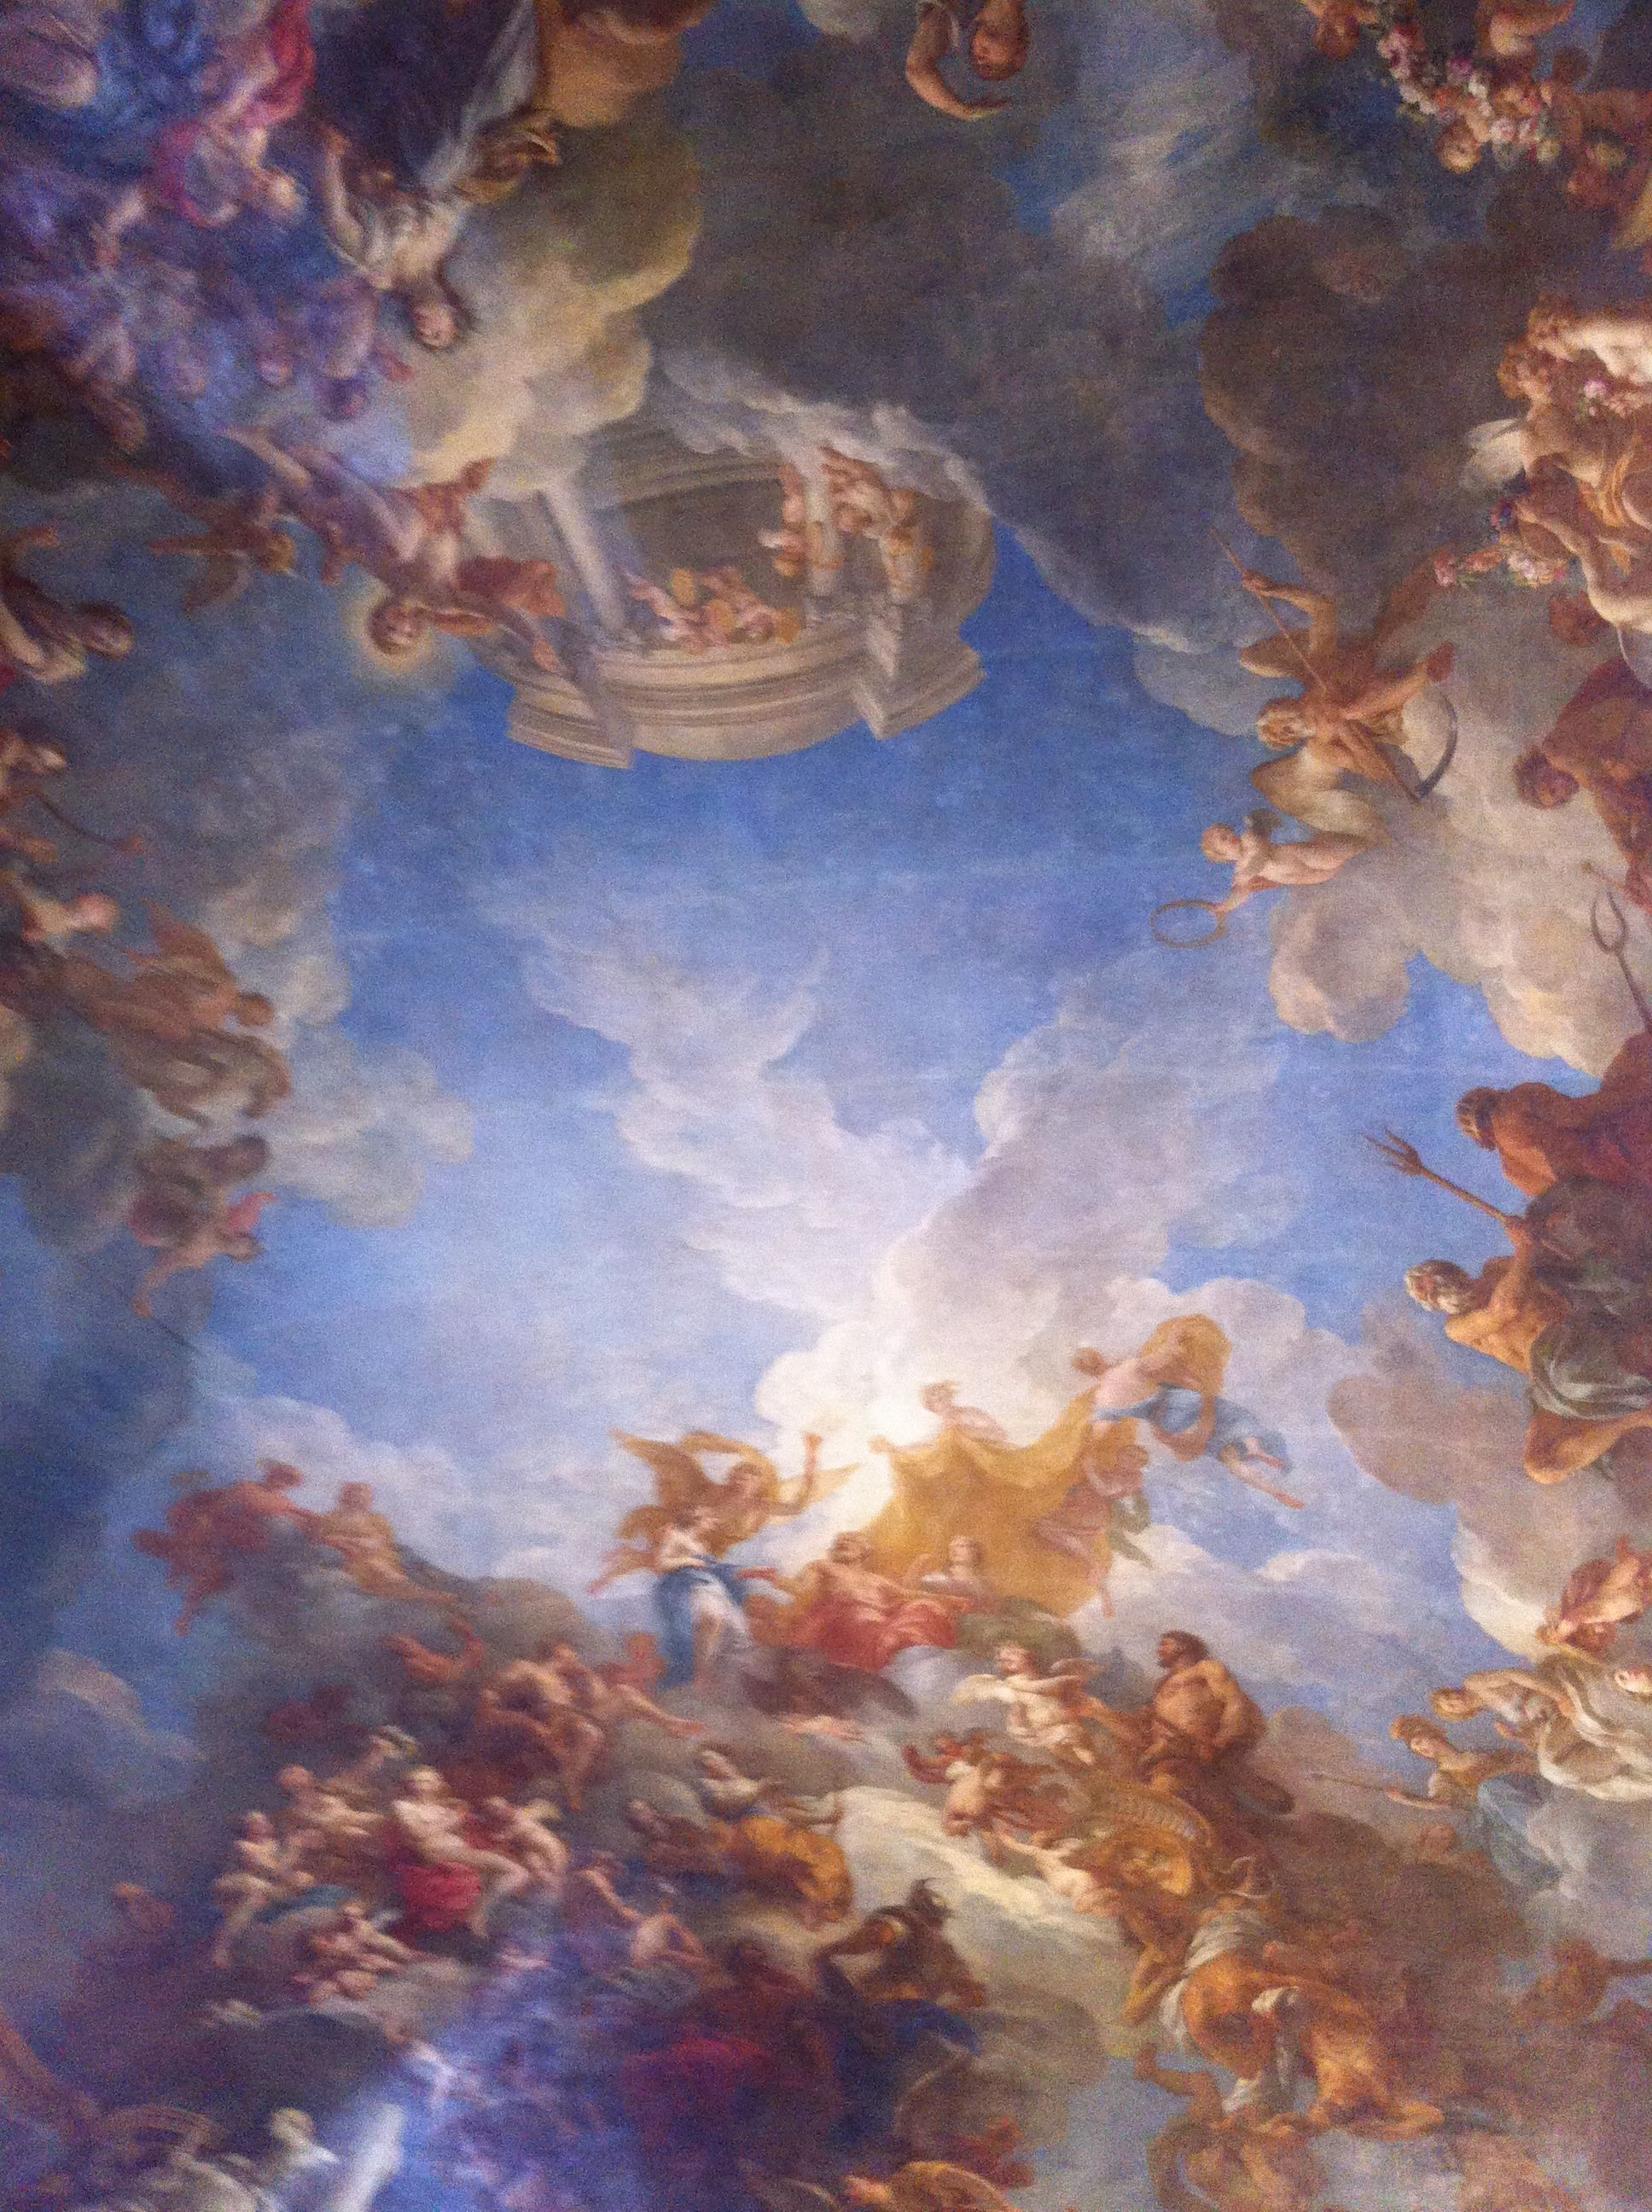 Aesthetic Art, Renaissance Art, Art Wallpaper